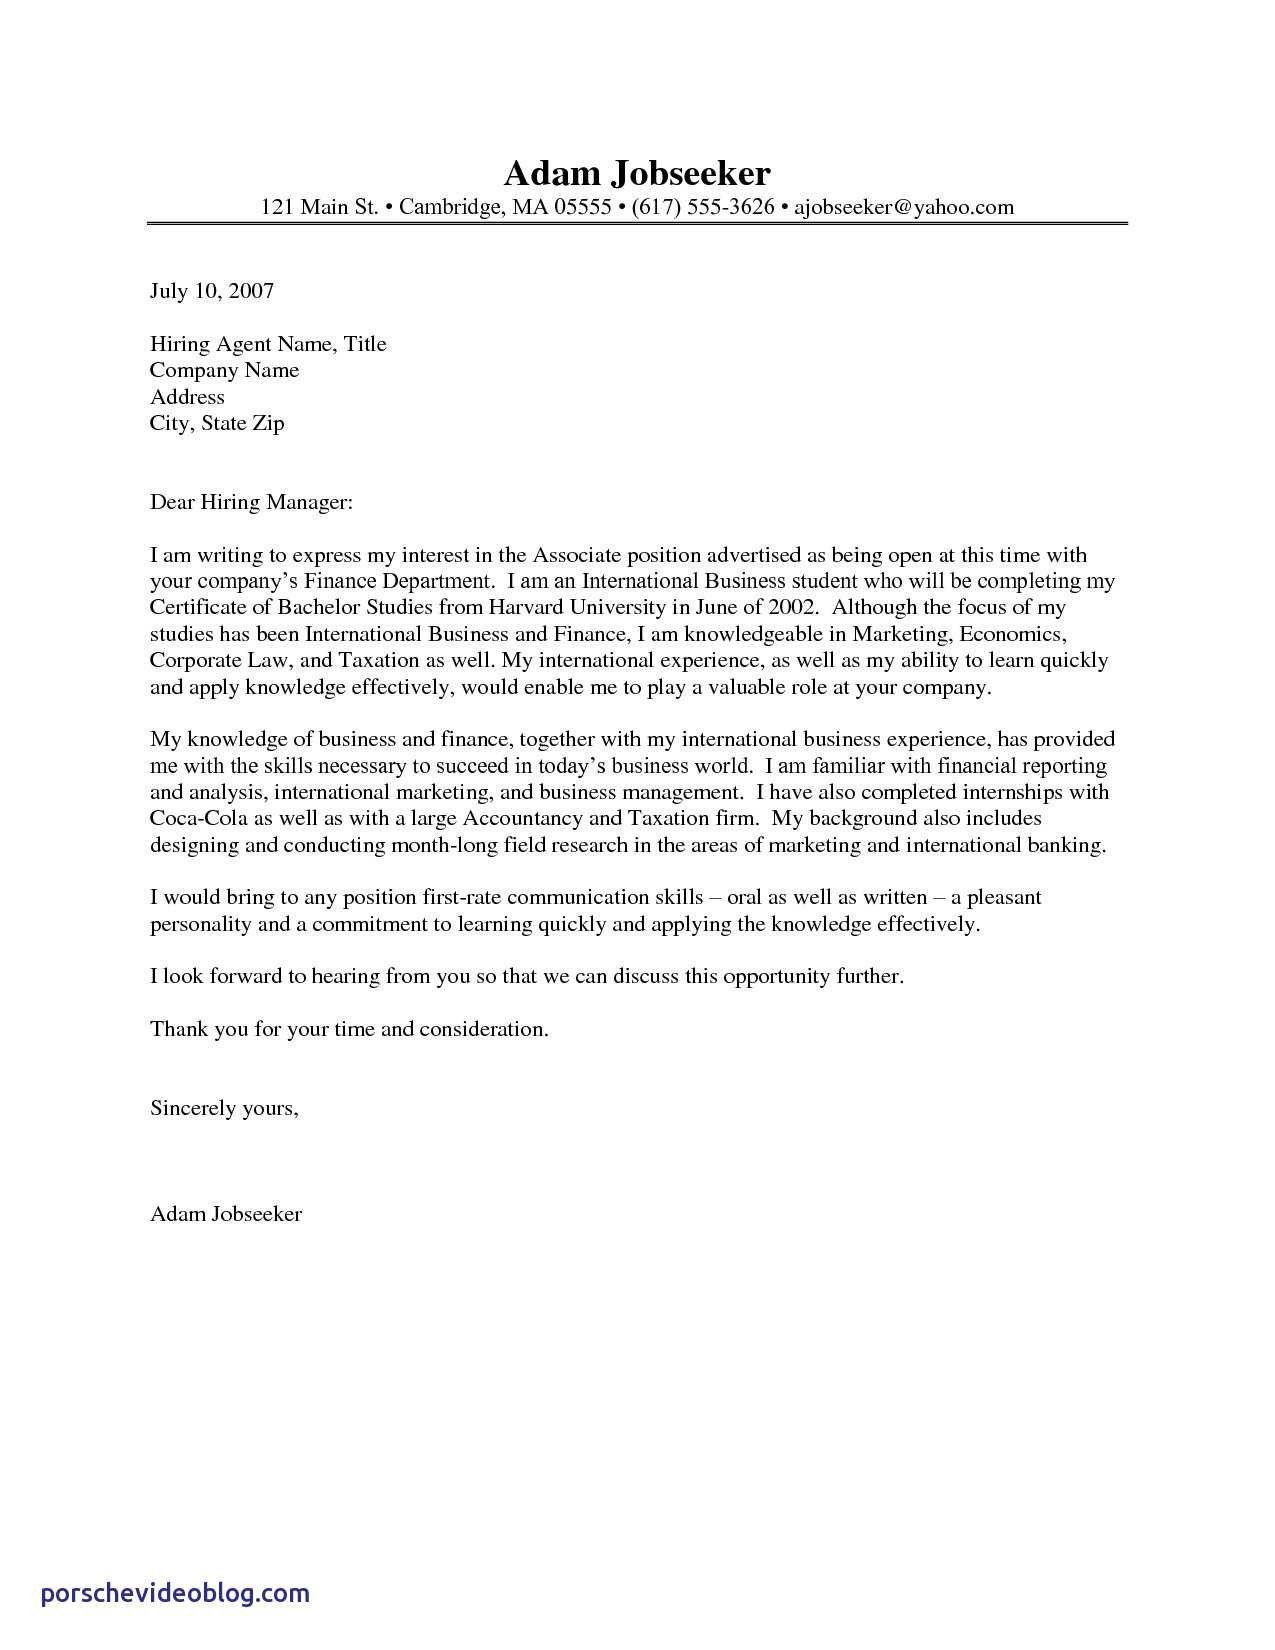 27 Best Cover Letter Samples Cover Letter For Internship Writing A Cover Letter Cover Letter For Resume